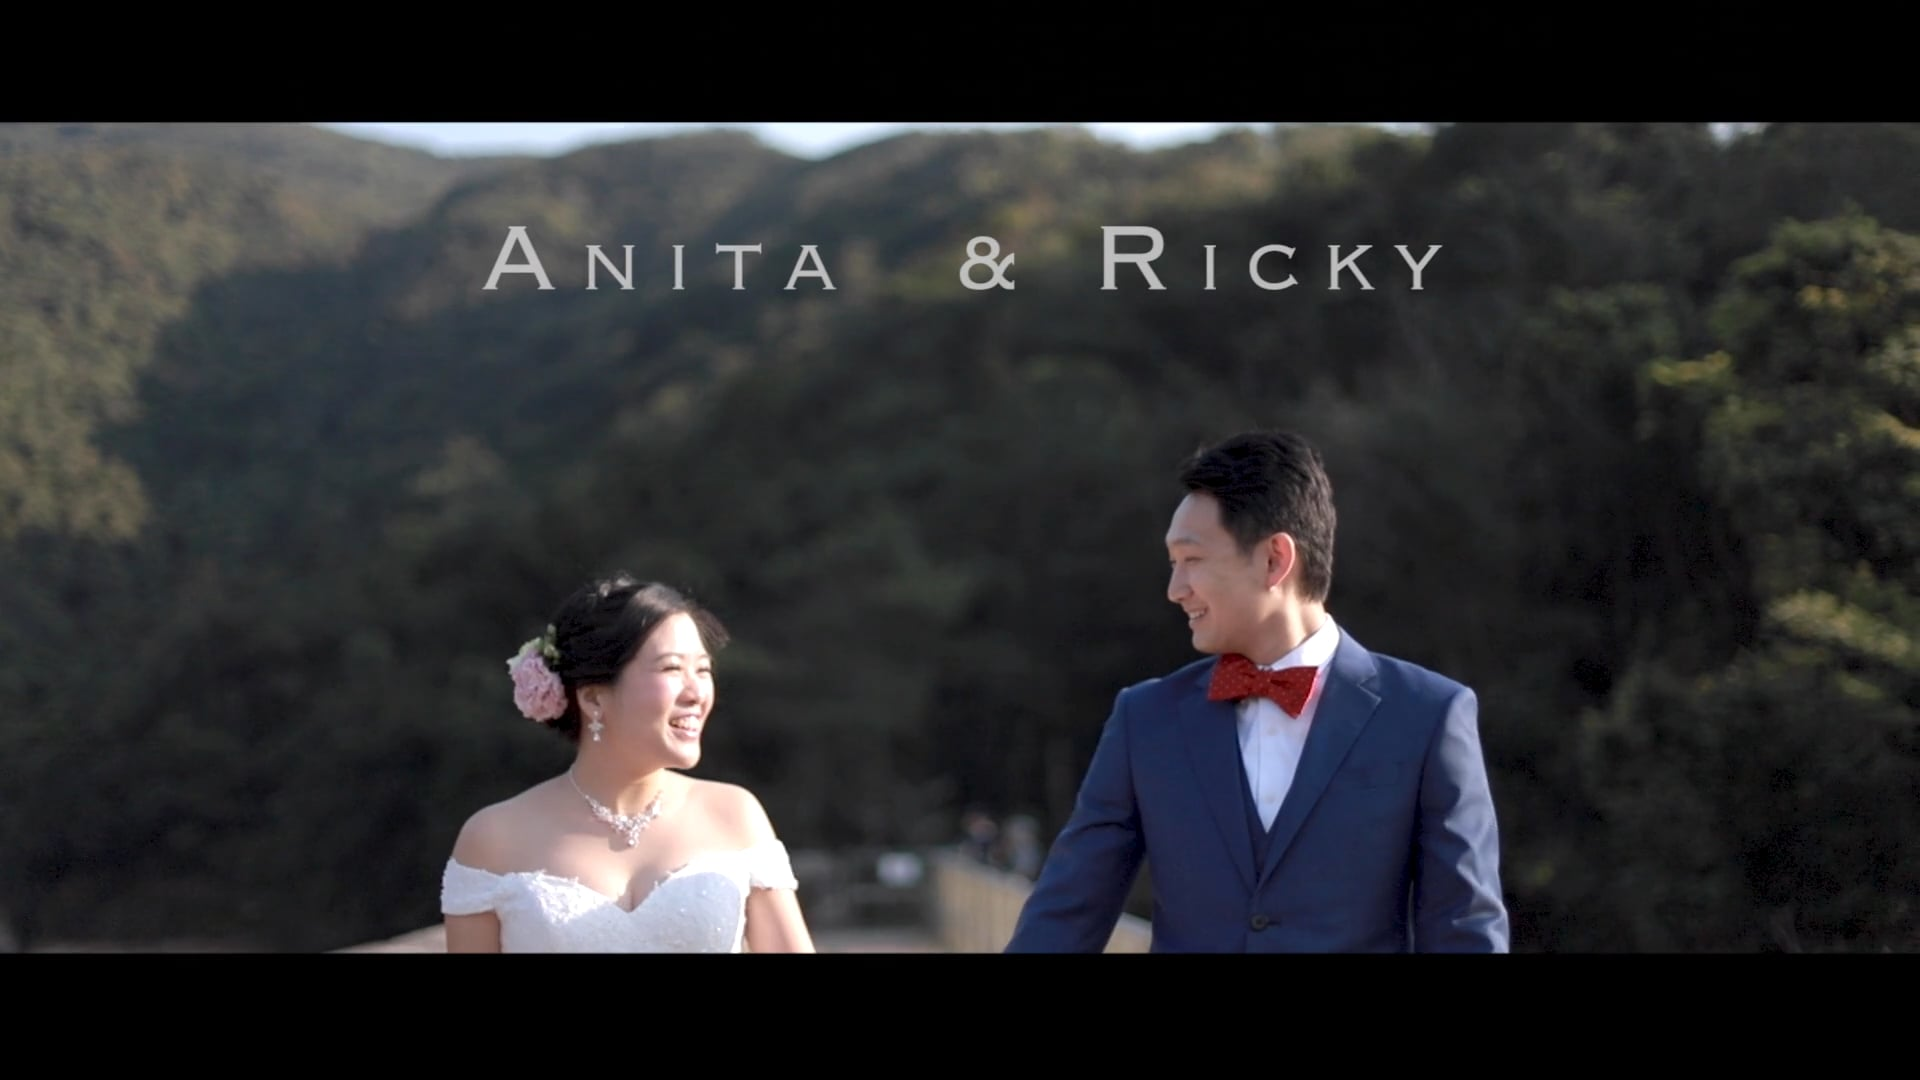 Anita & Ricky